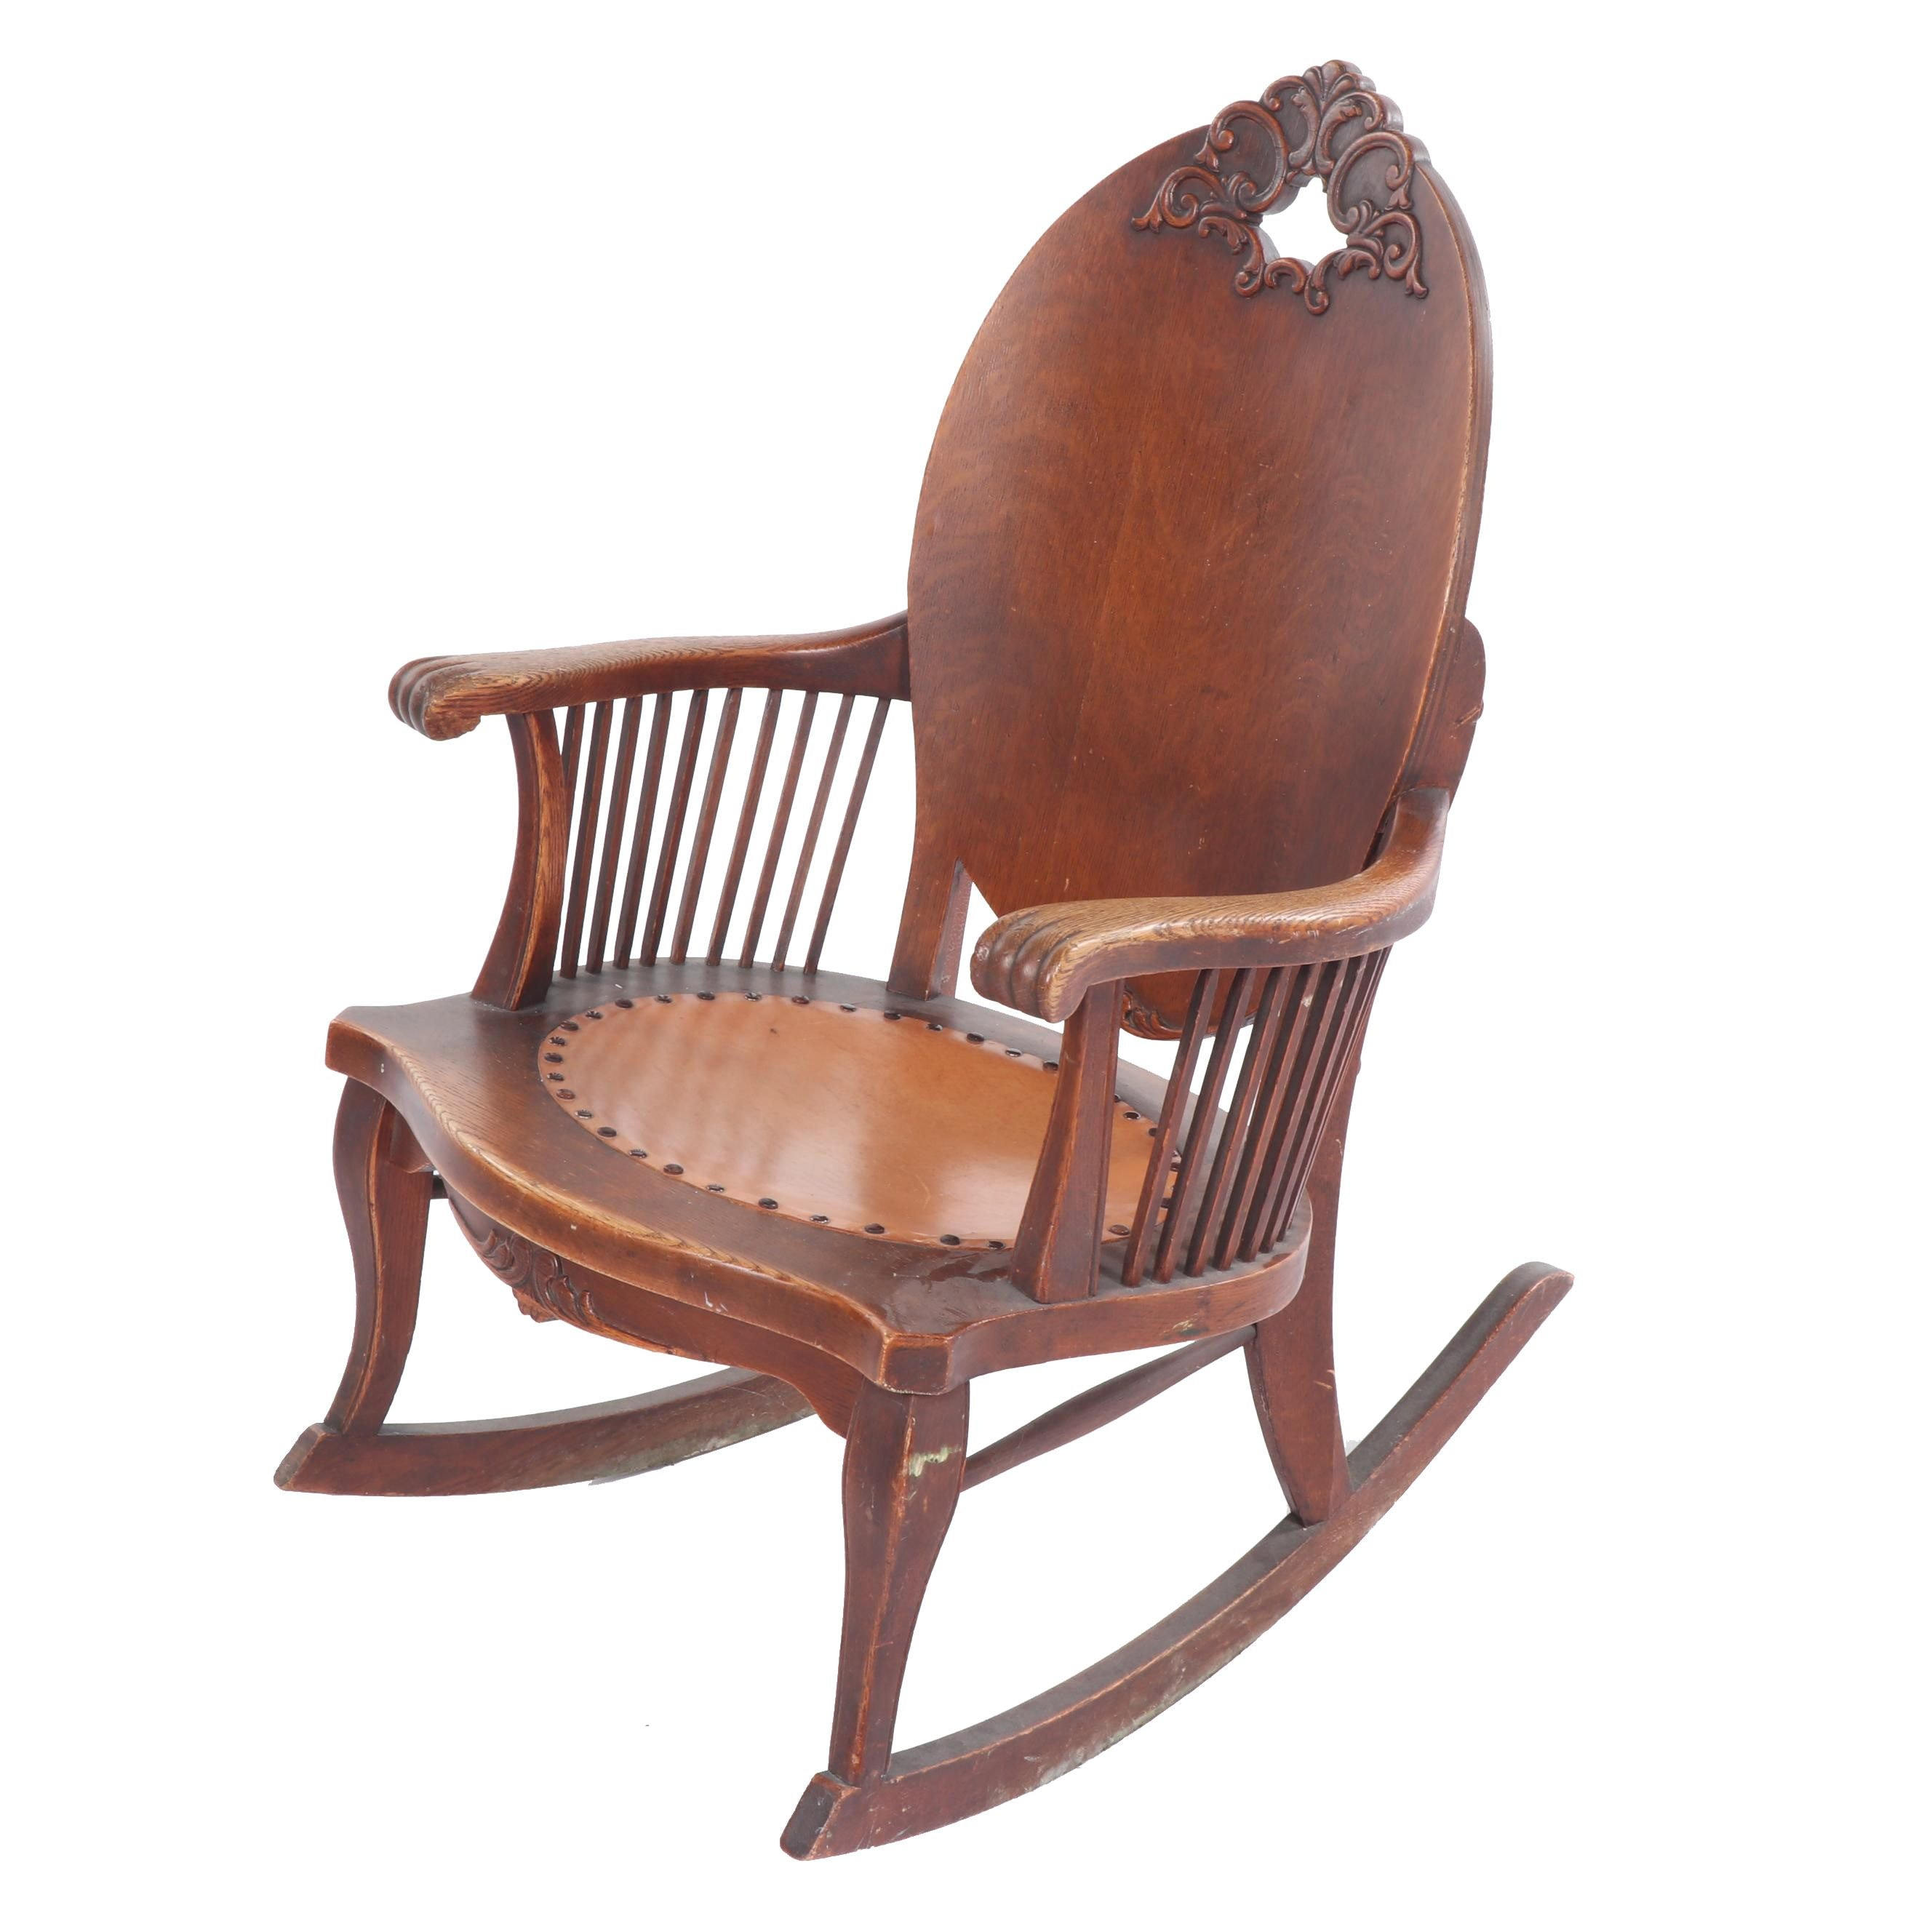 American Oak Rocking Chair, Early 20th Century